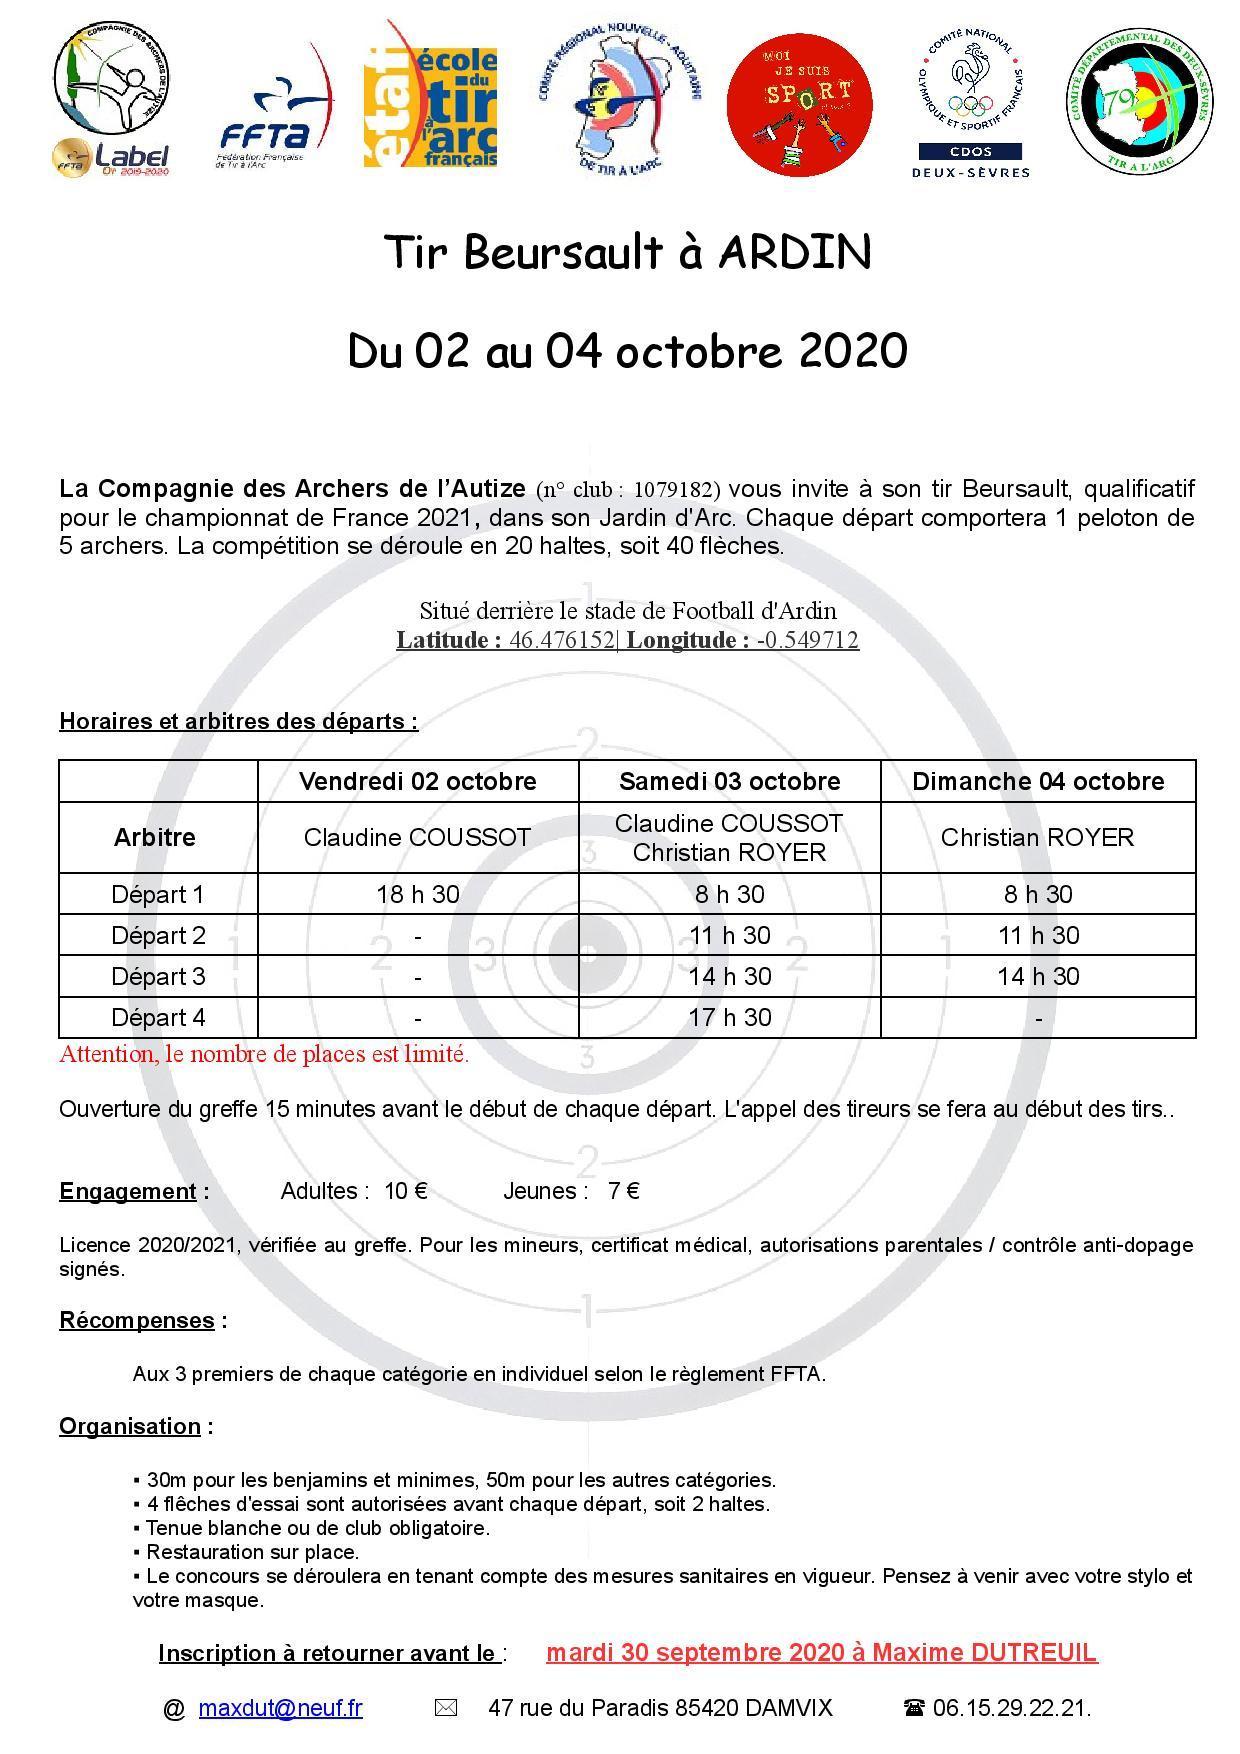 Mandat beursault 2020